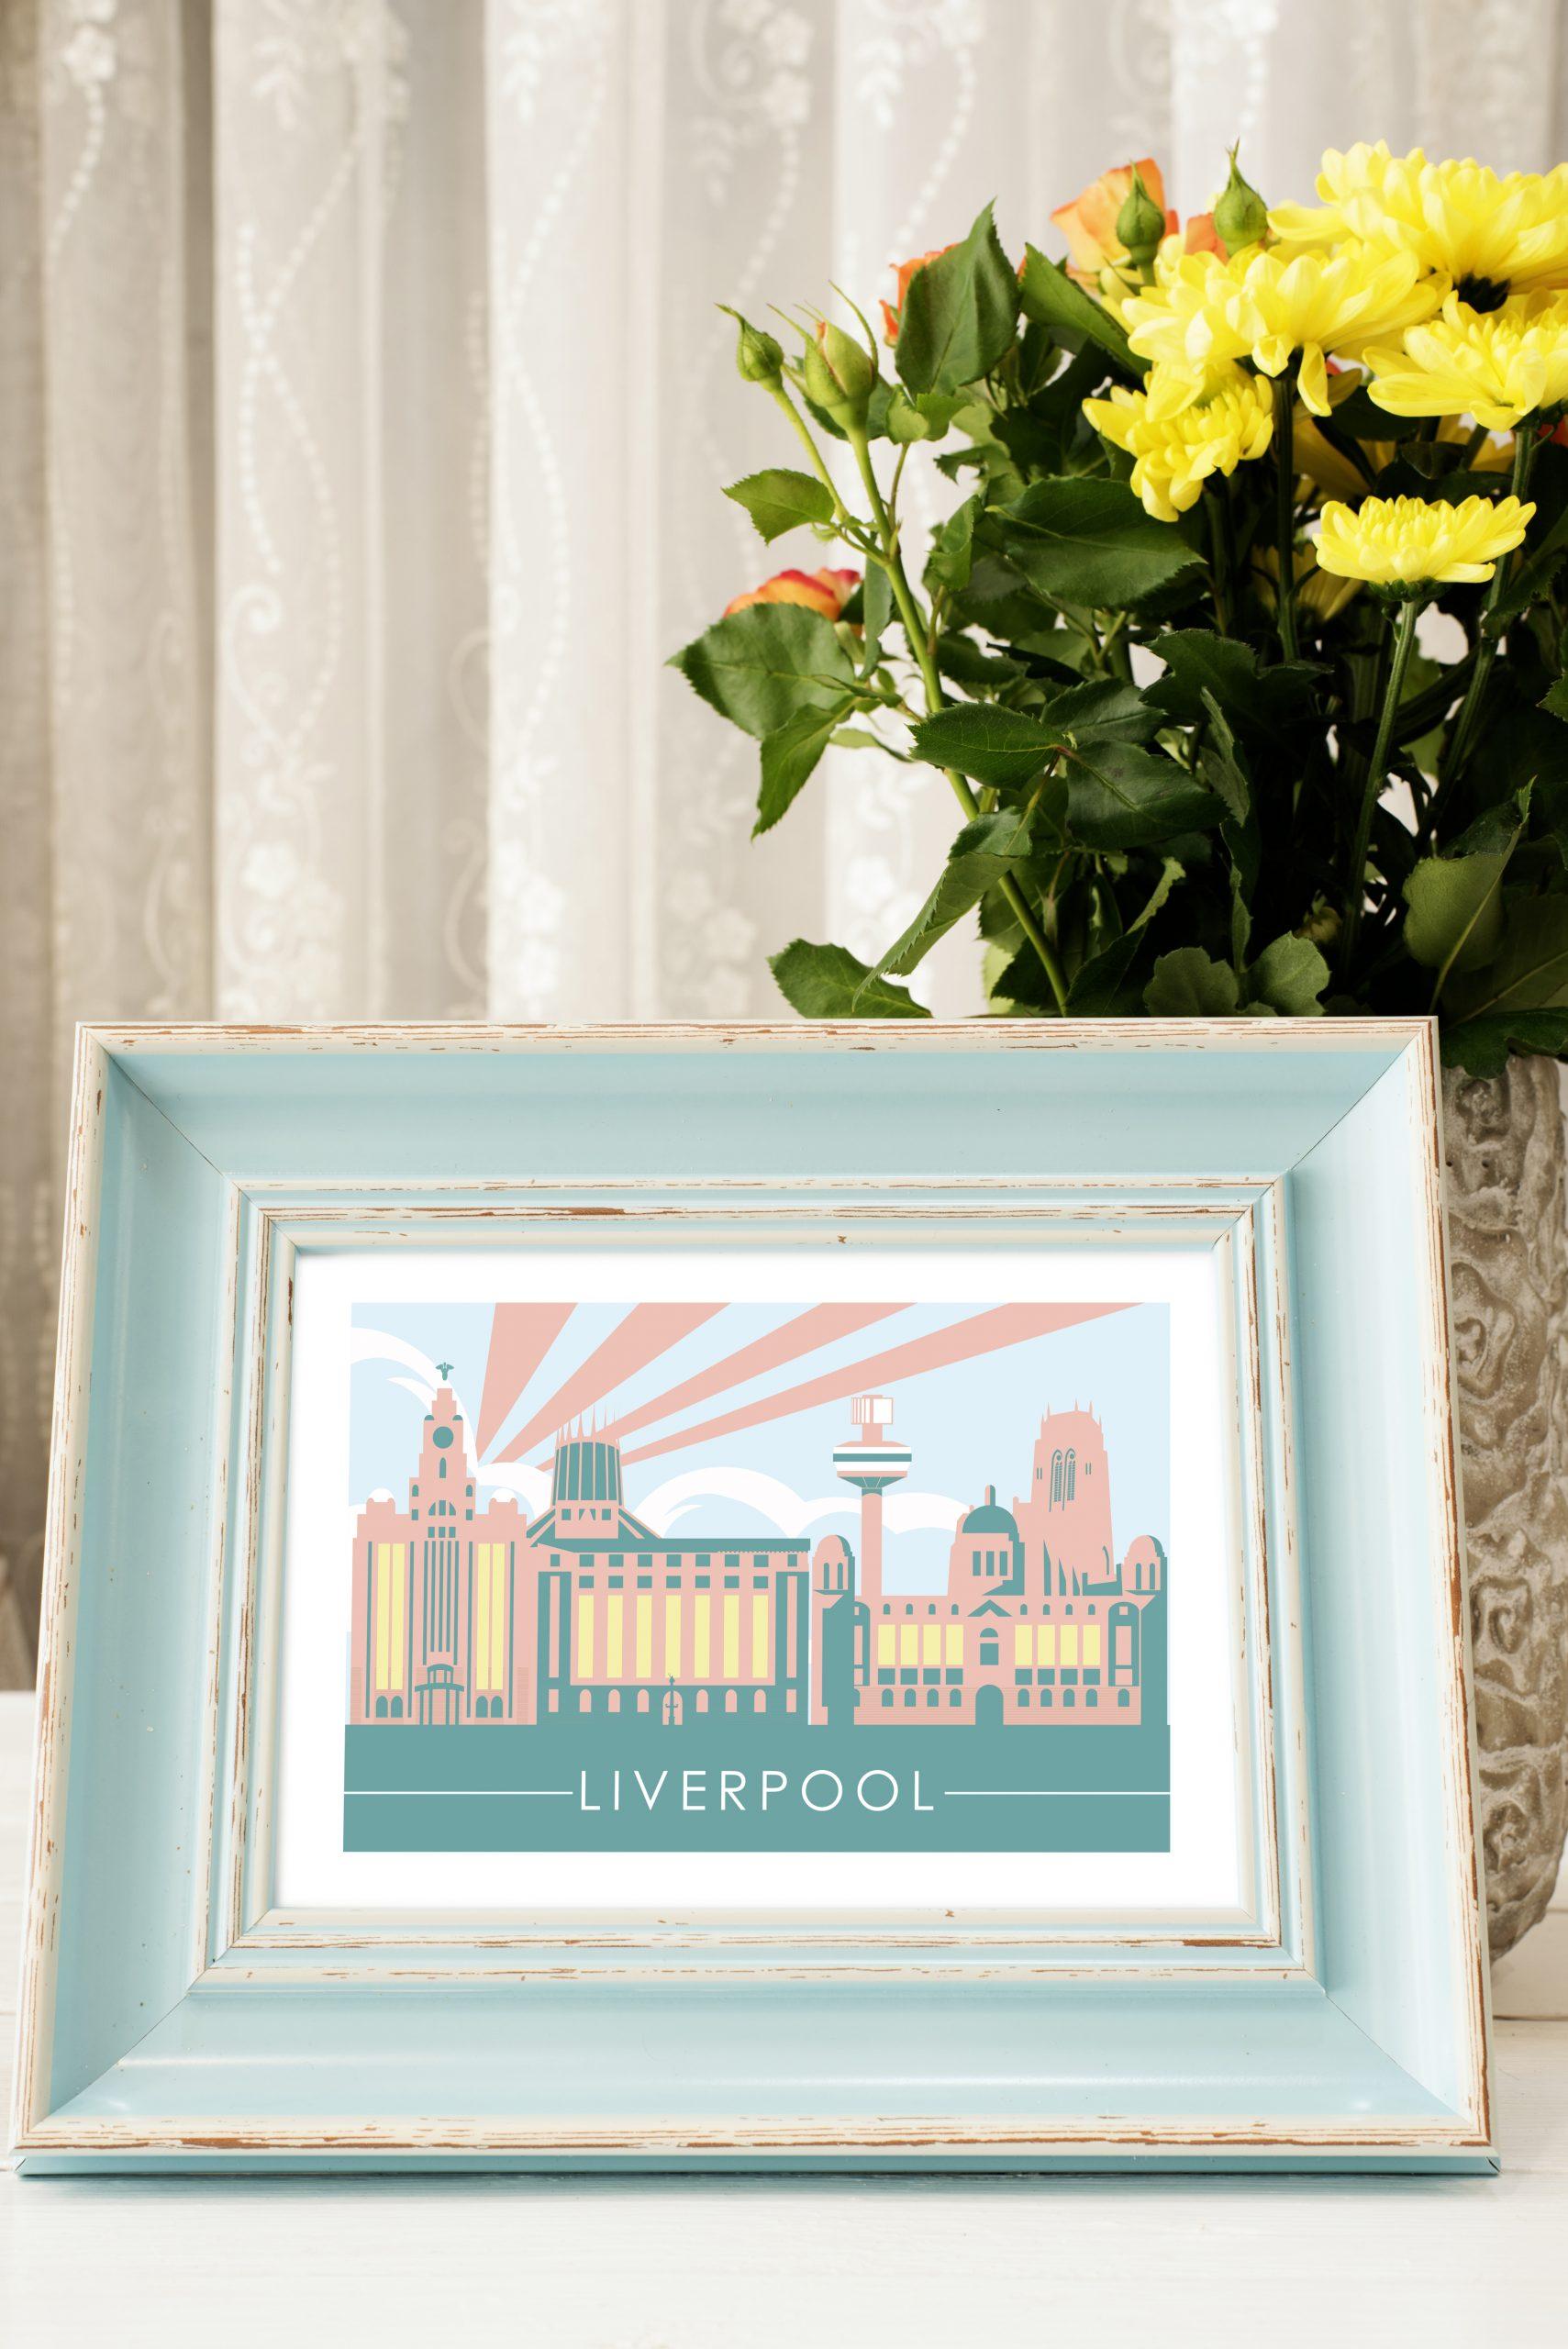 Liverpool Skyline Print – The Jones Boys